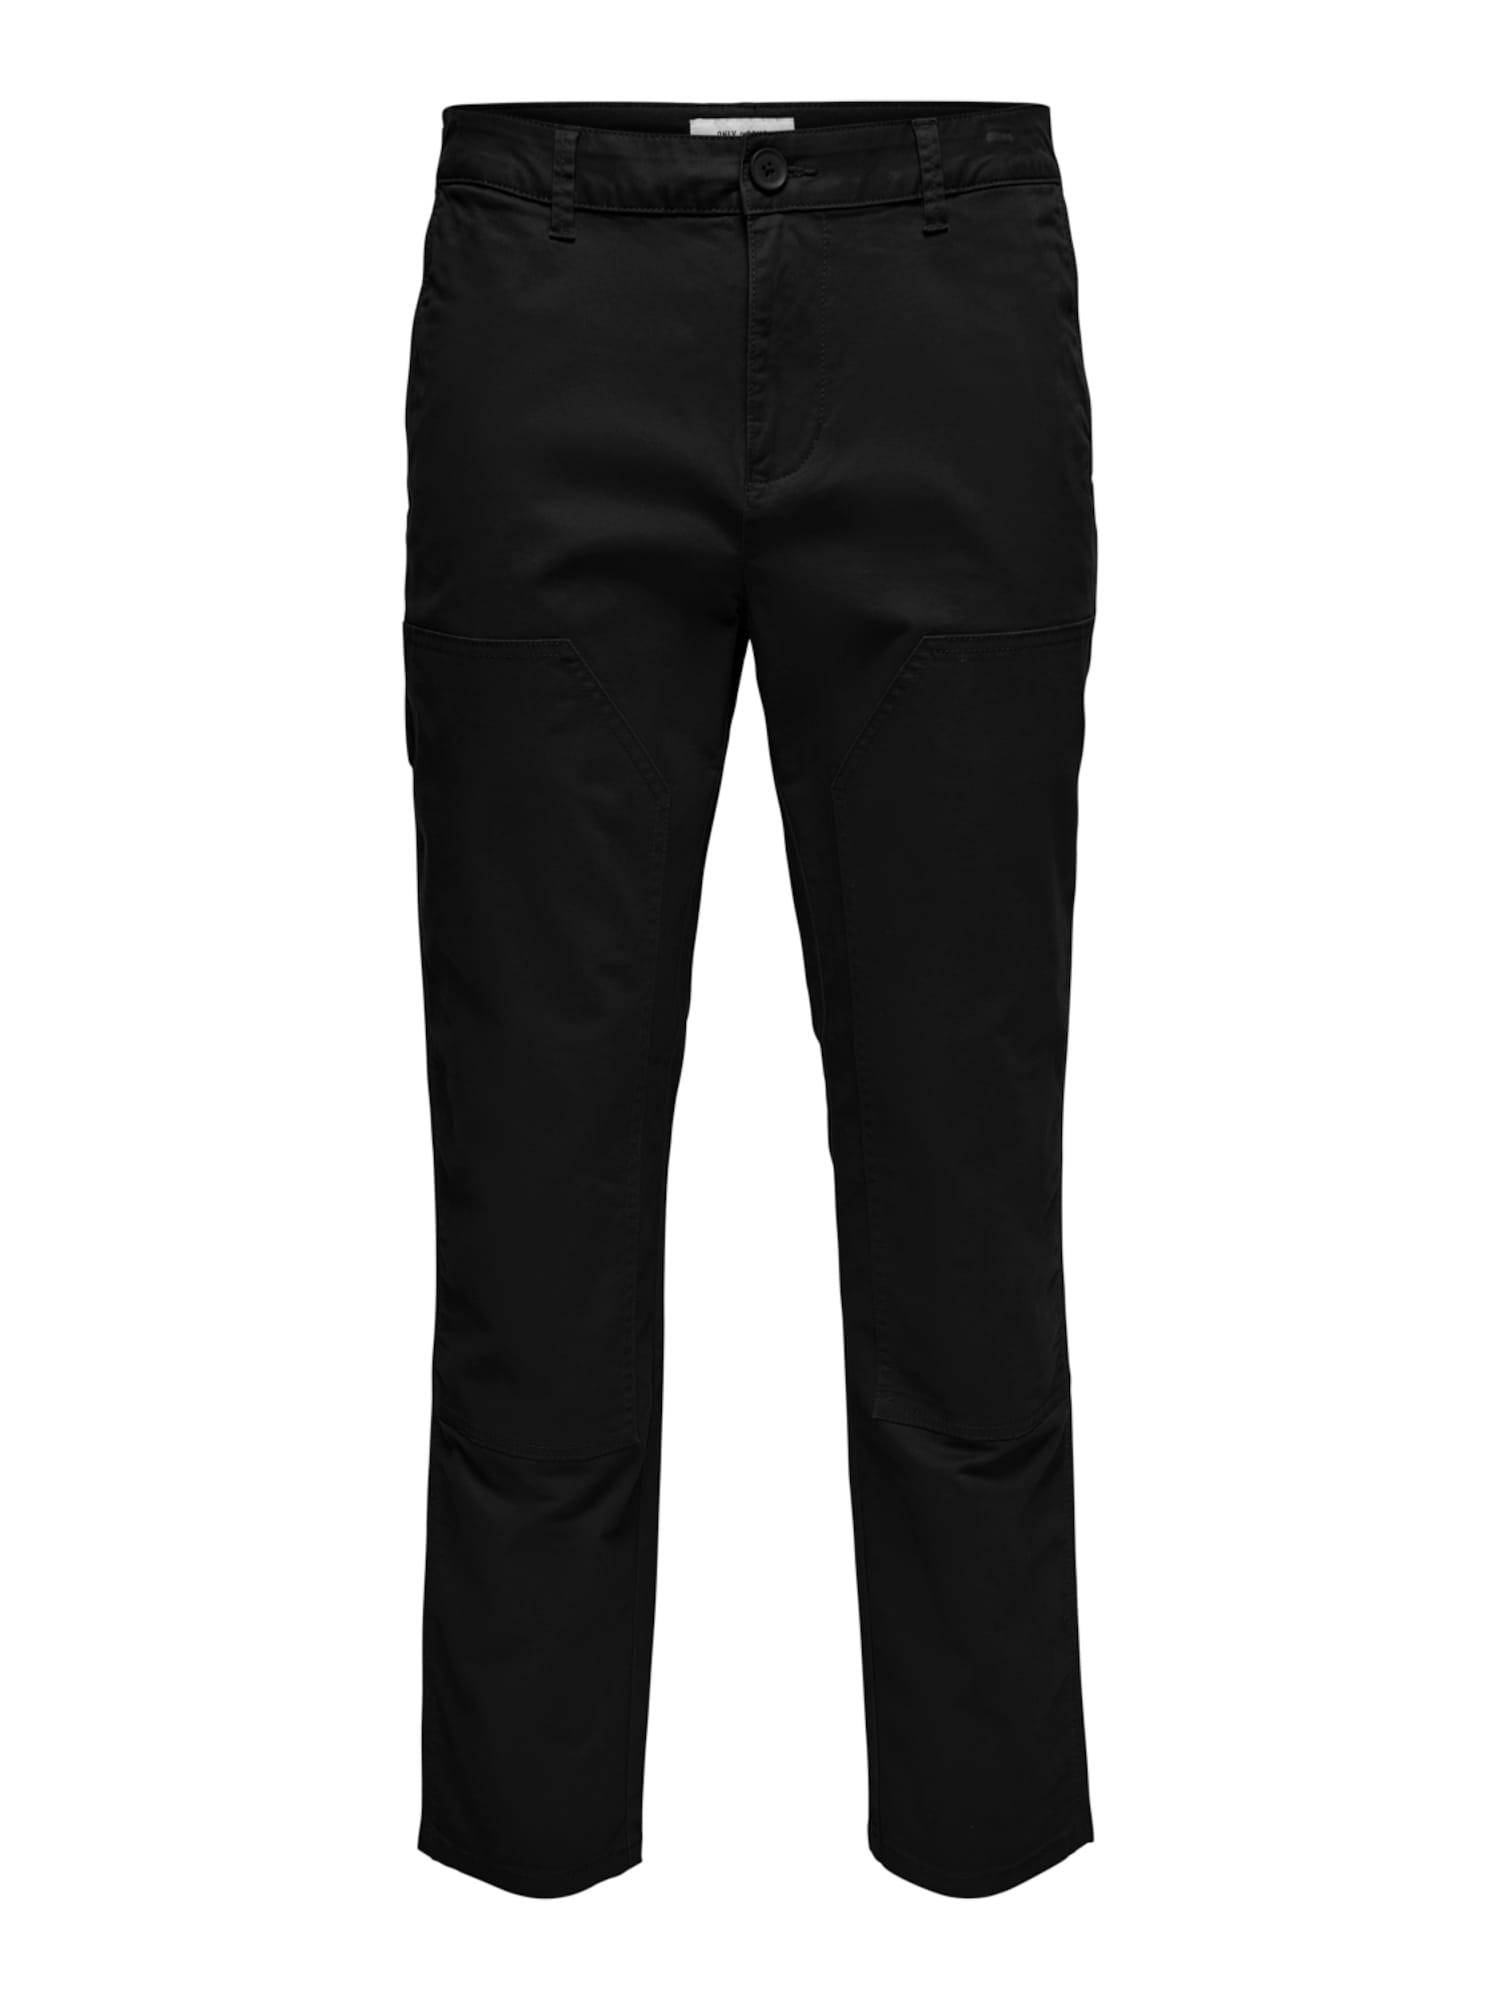 Only & Sons Pantalon 'Cam'  - Noir - Taille: 32 - male